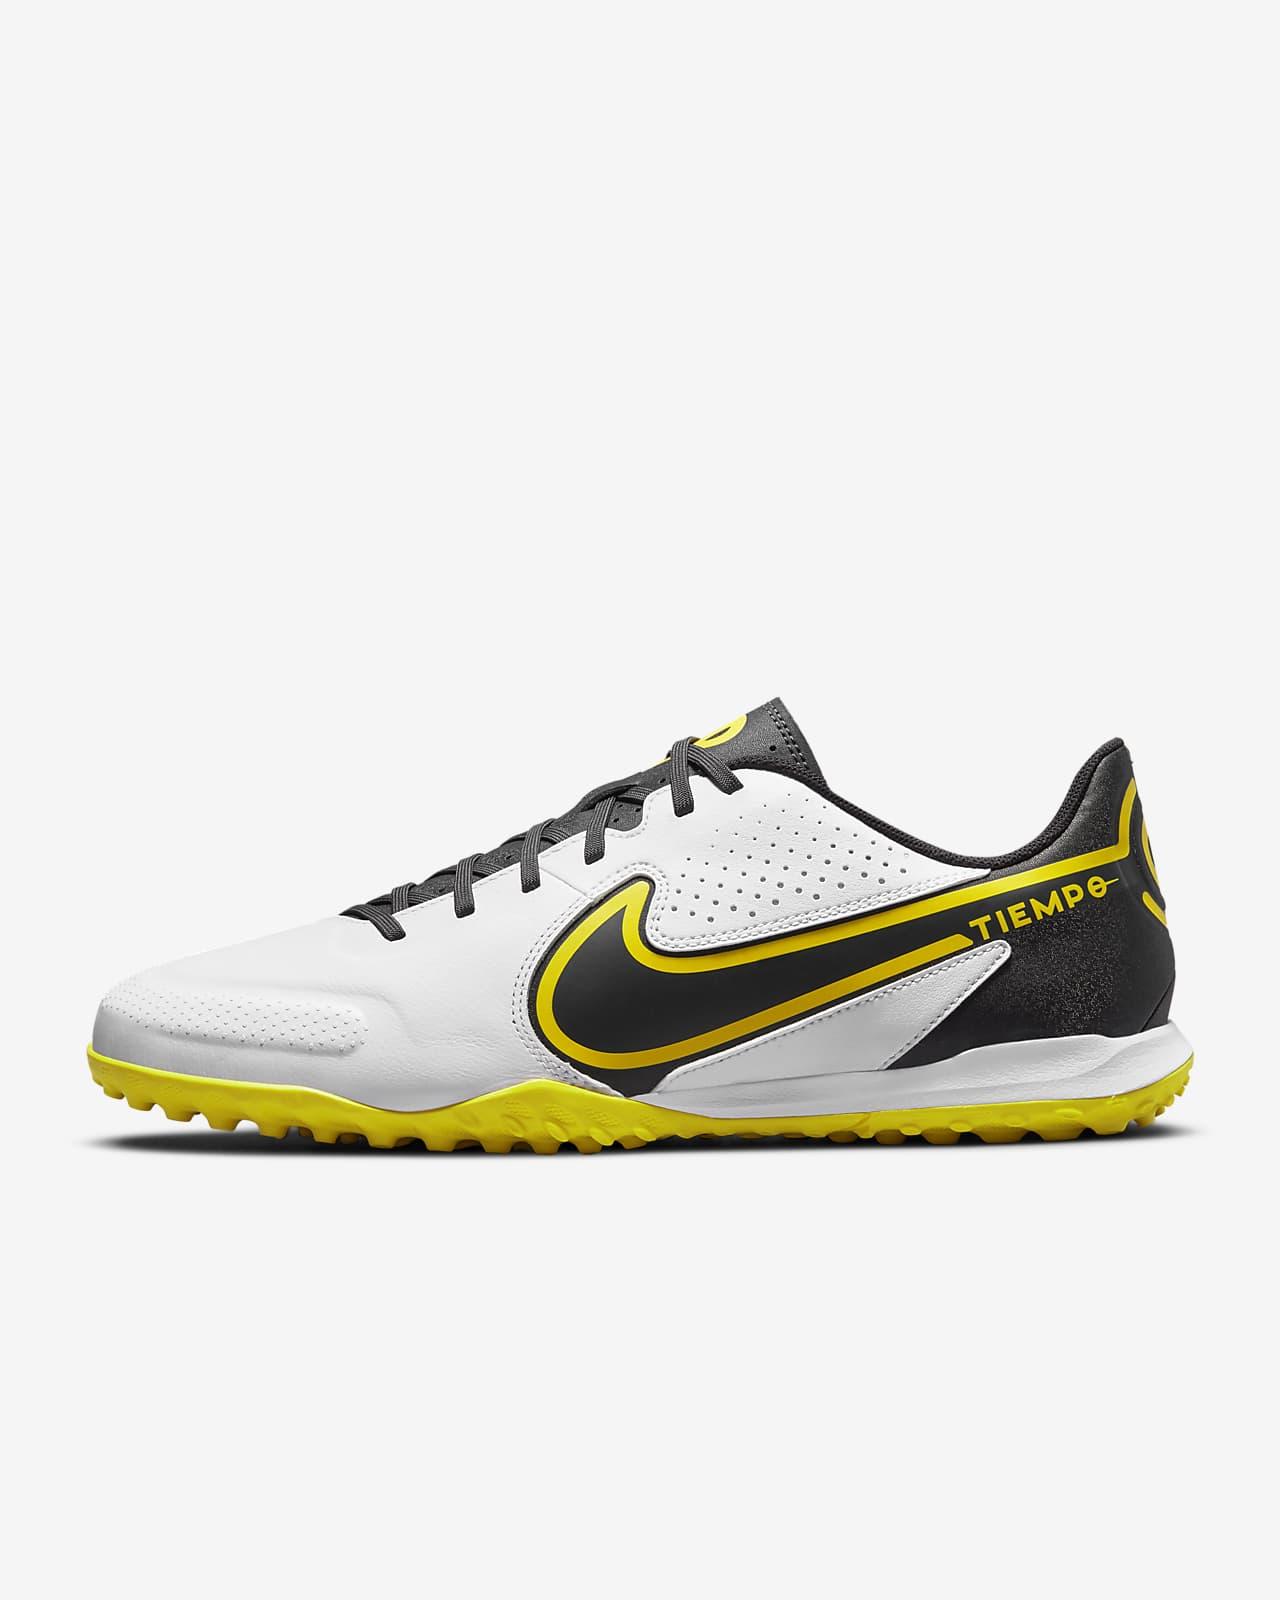 Nike Tiempo Legend 9 Academy TF Turf Football Shoe